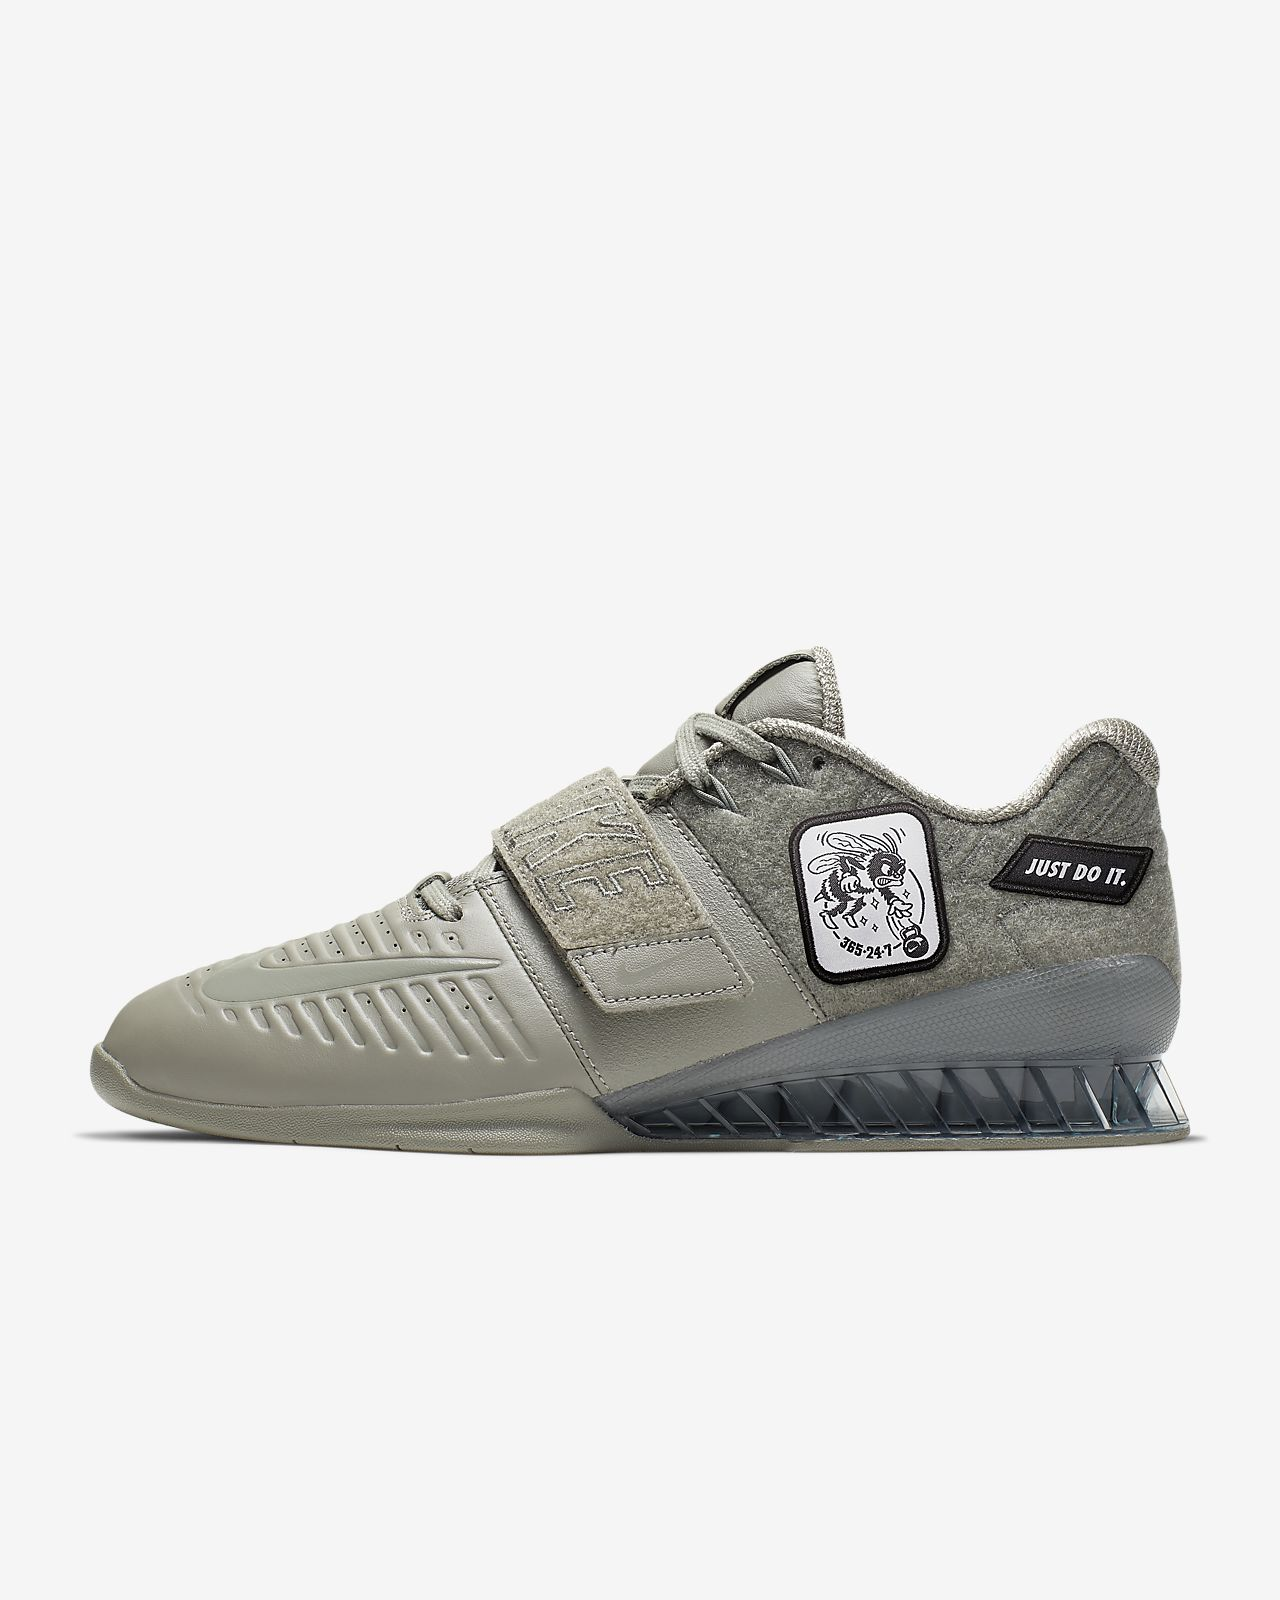 Кроссовки для тренинга Nike Romaleos 3 XD Patch